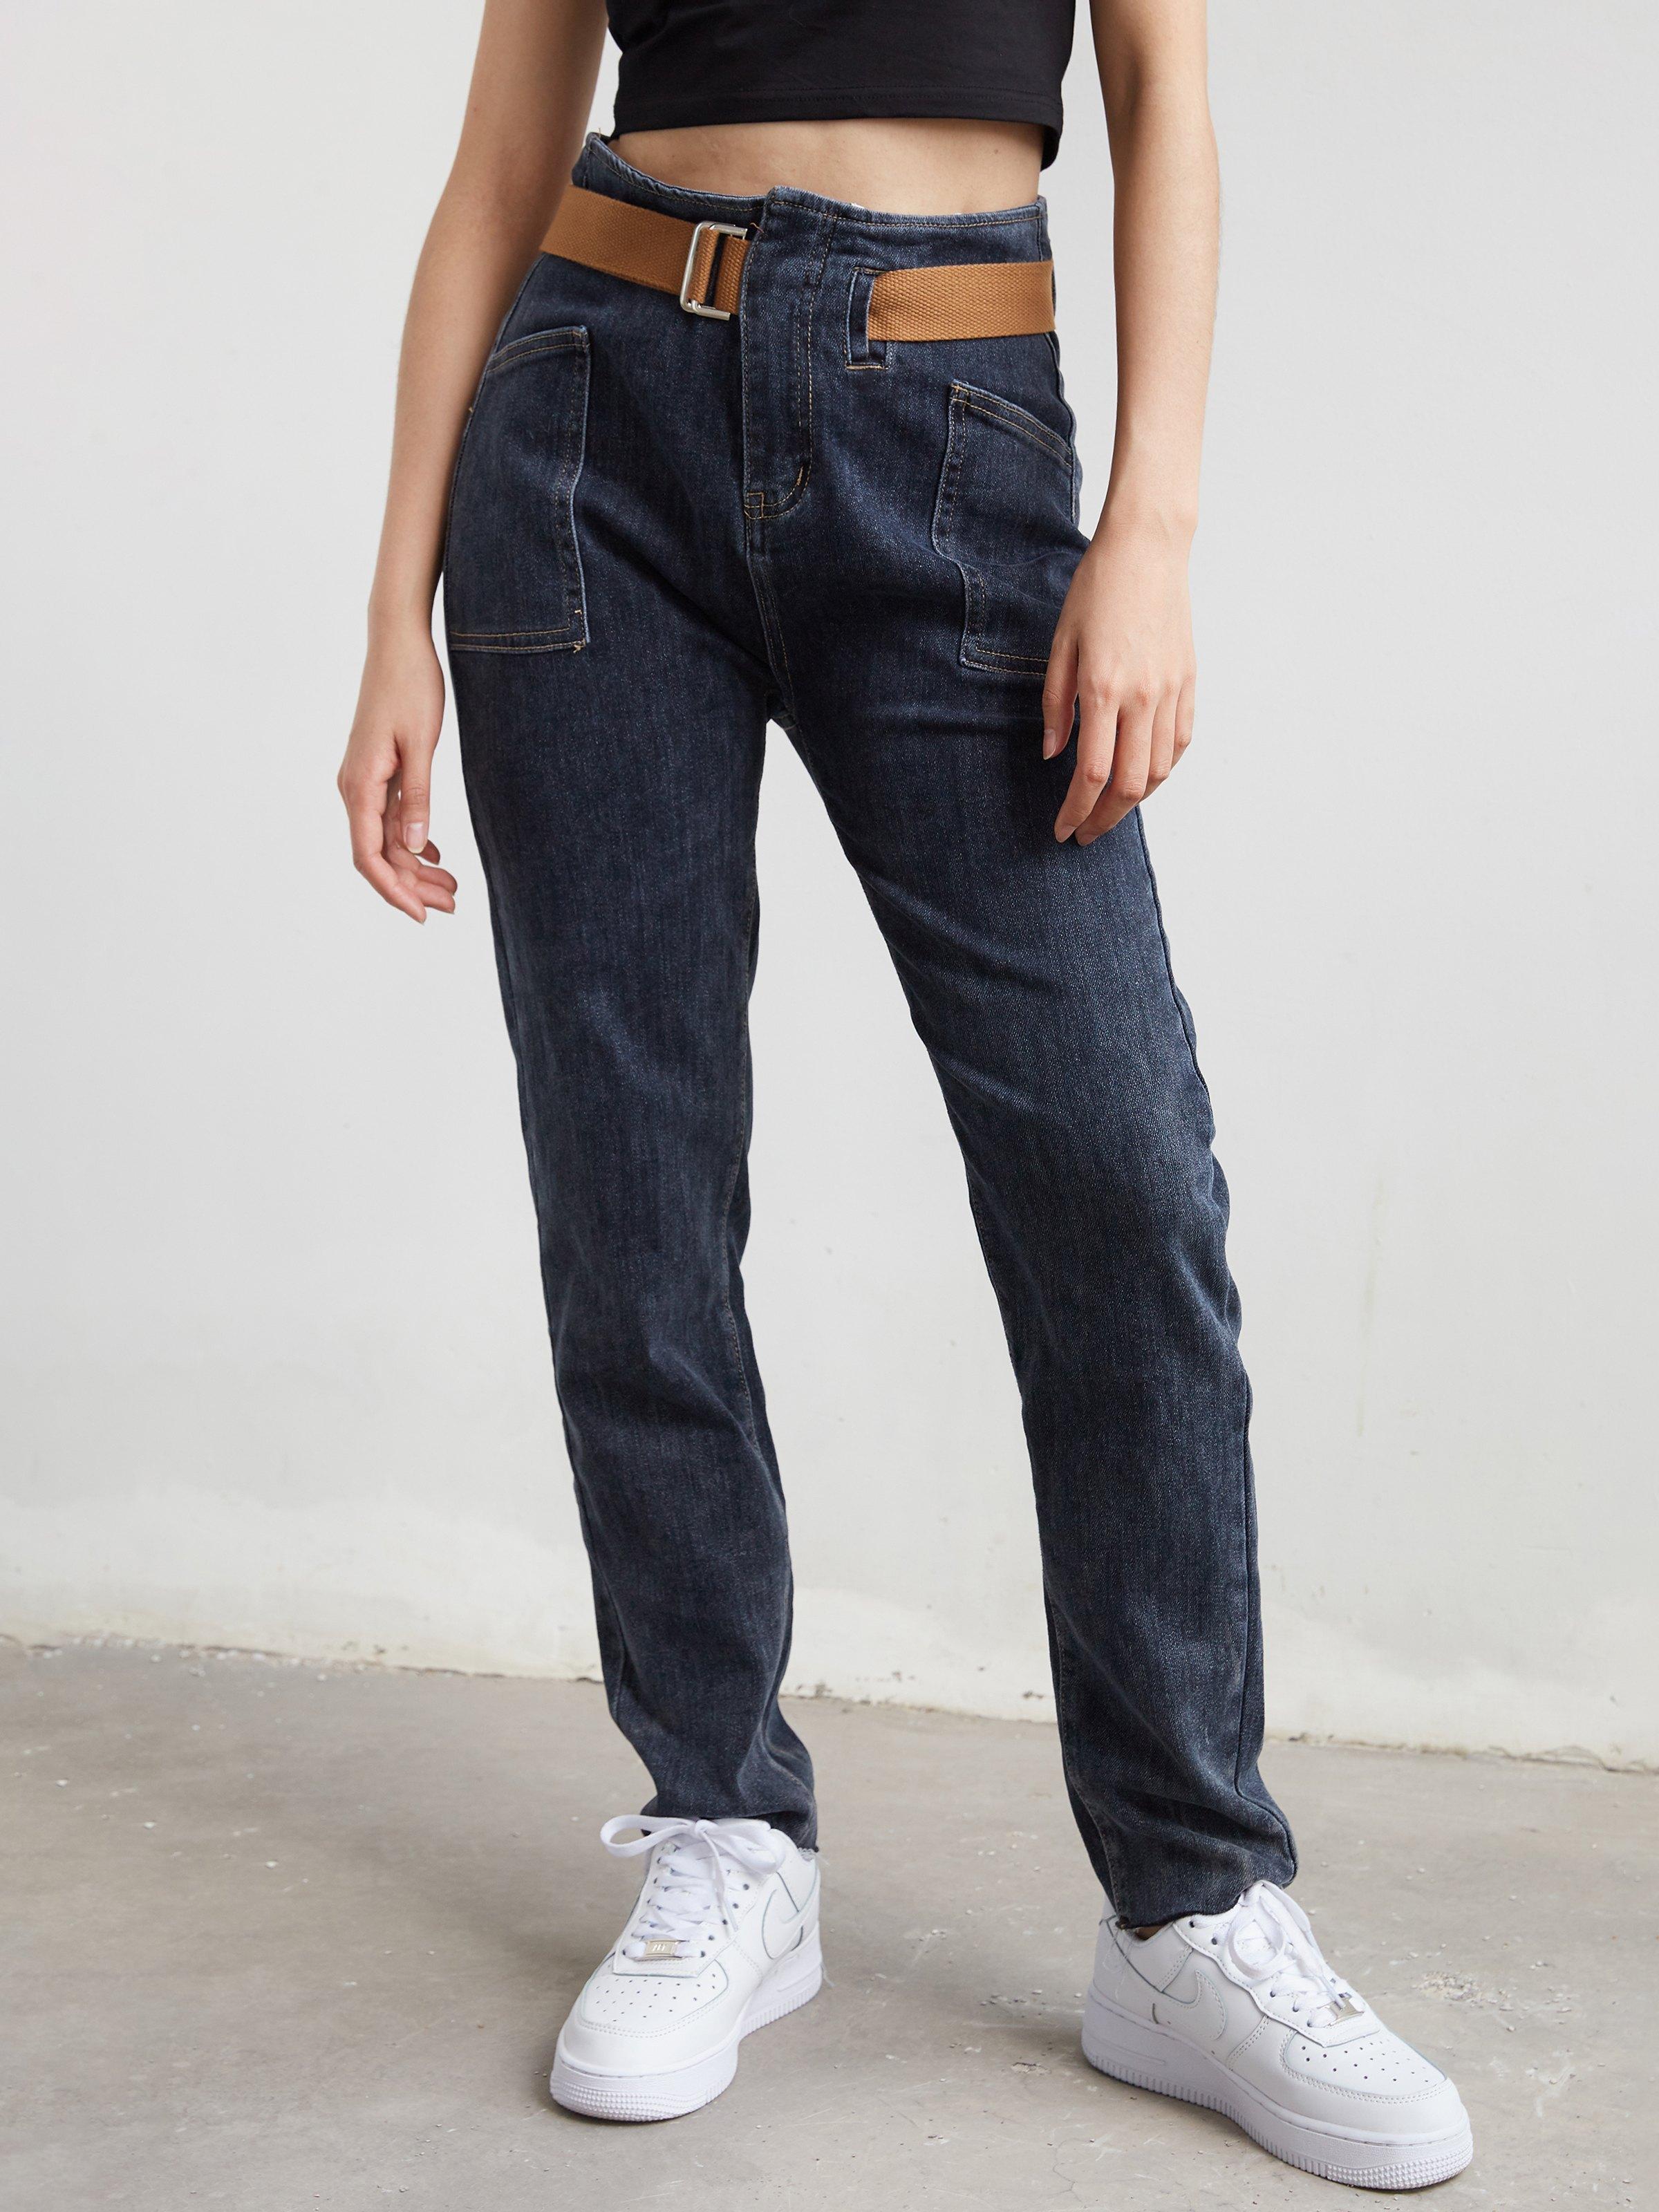 Belt Detail Cargo Jeans - Navy Blue L